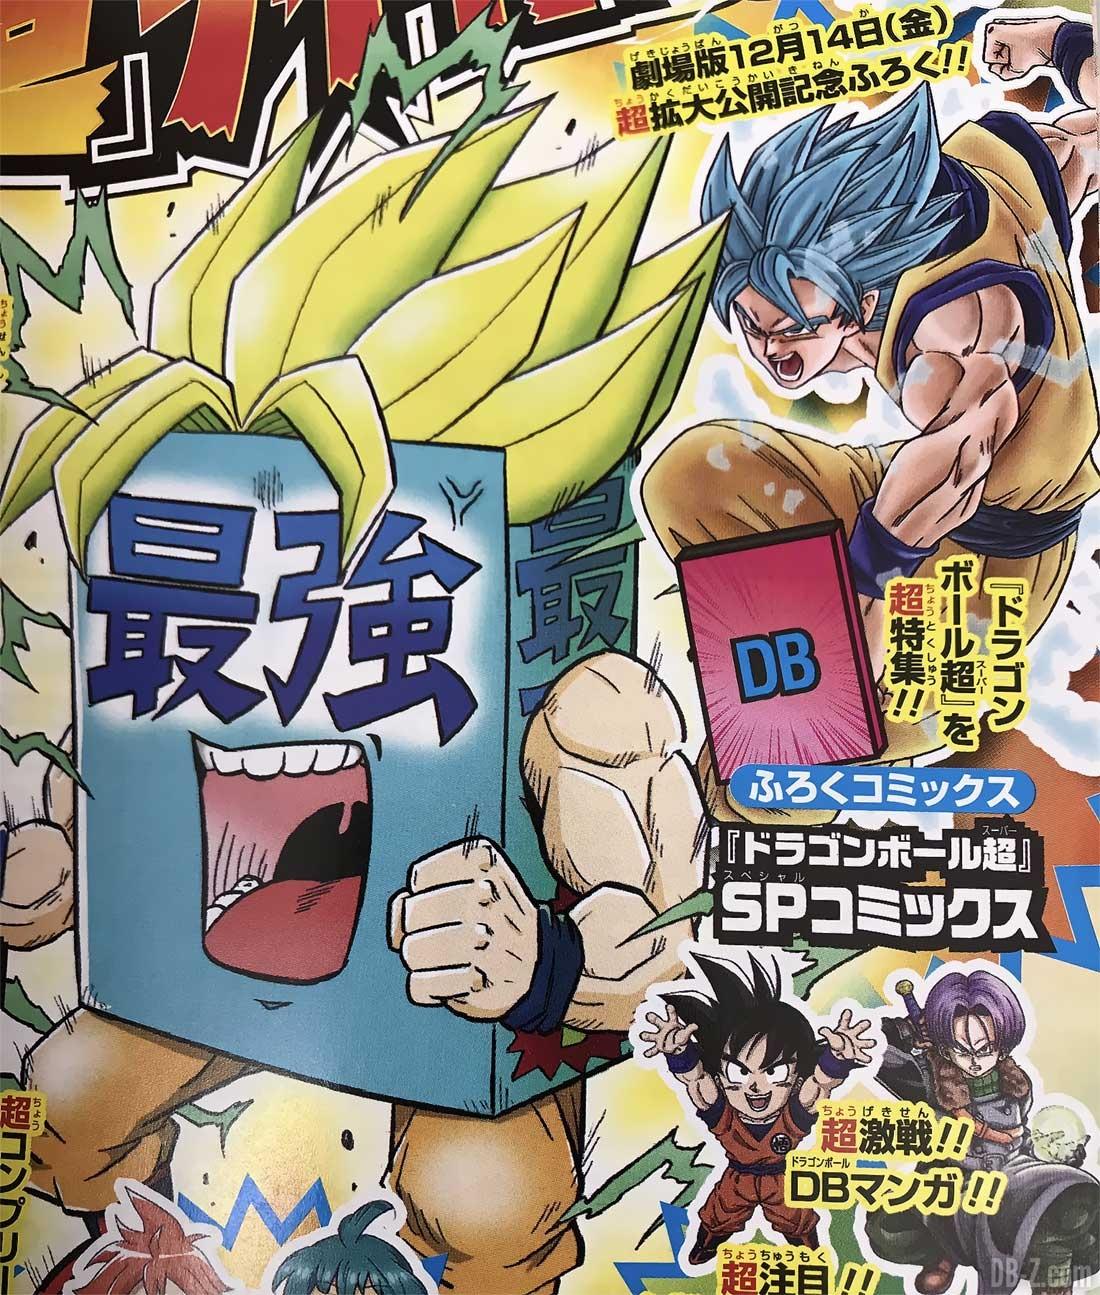 Dragon Ball Super BROLY - Manga Special dans le Saikyo Jump